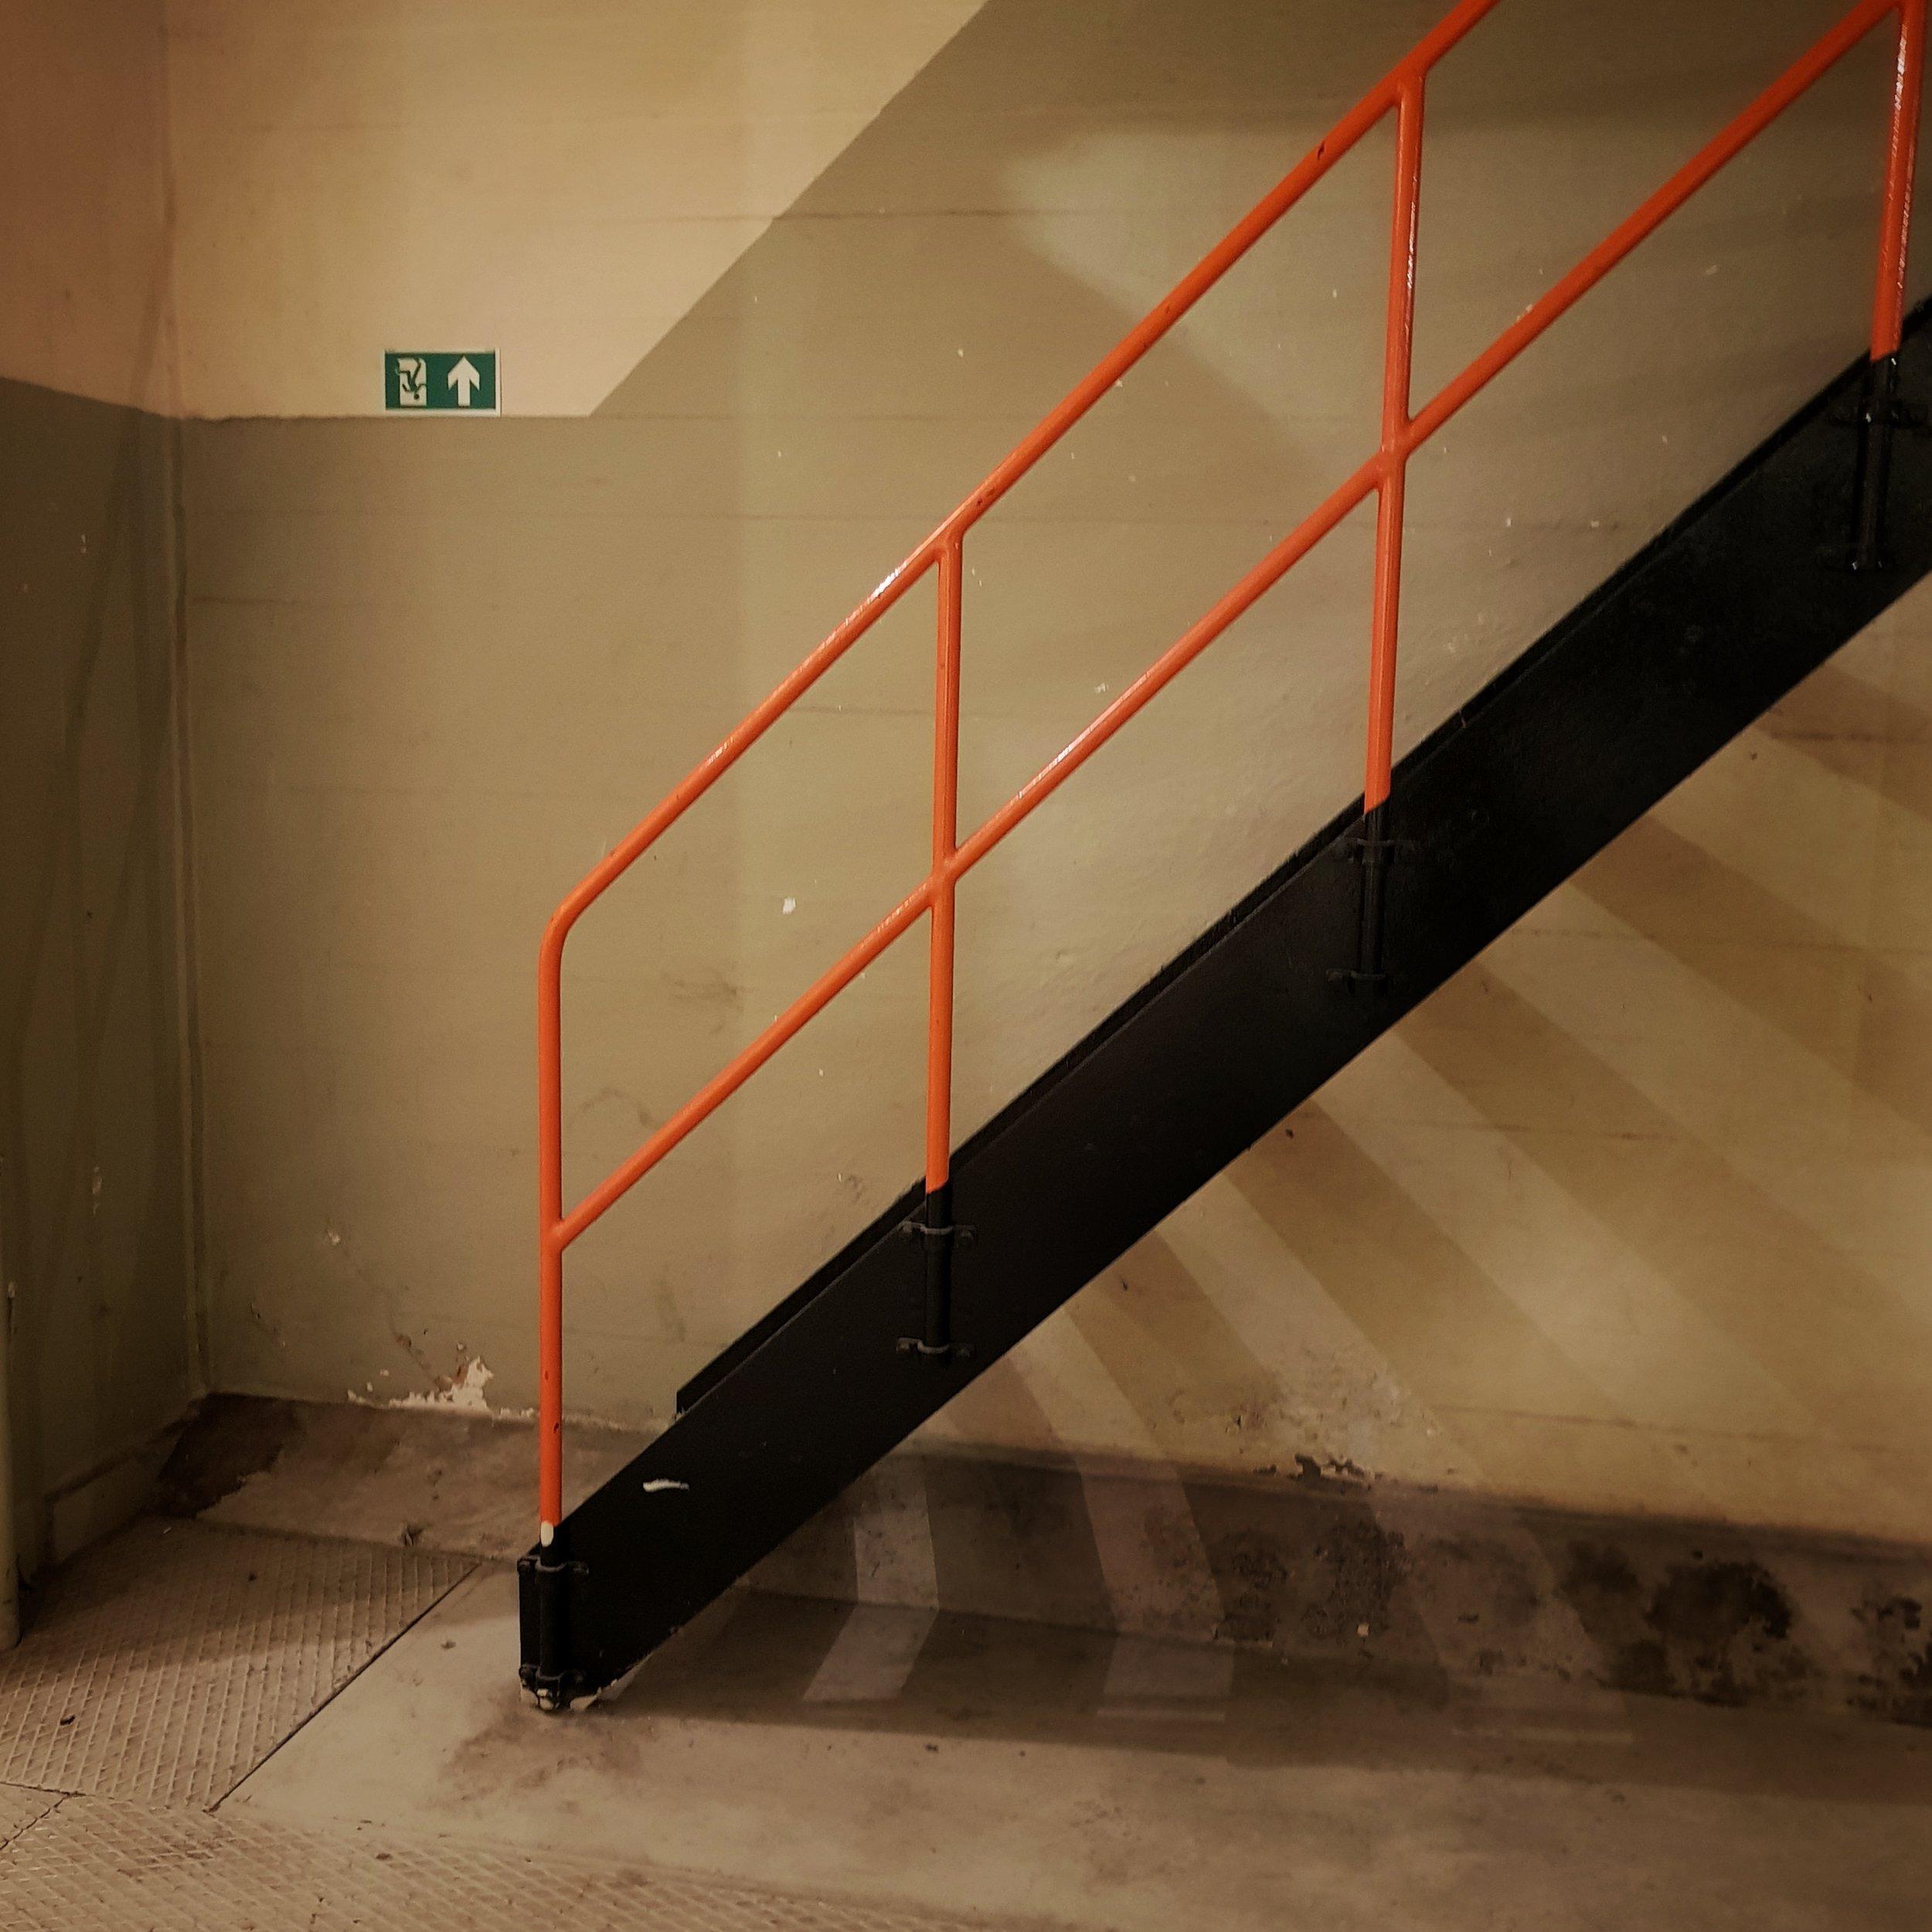 Day 178 - June 27: Stairway